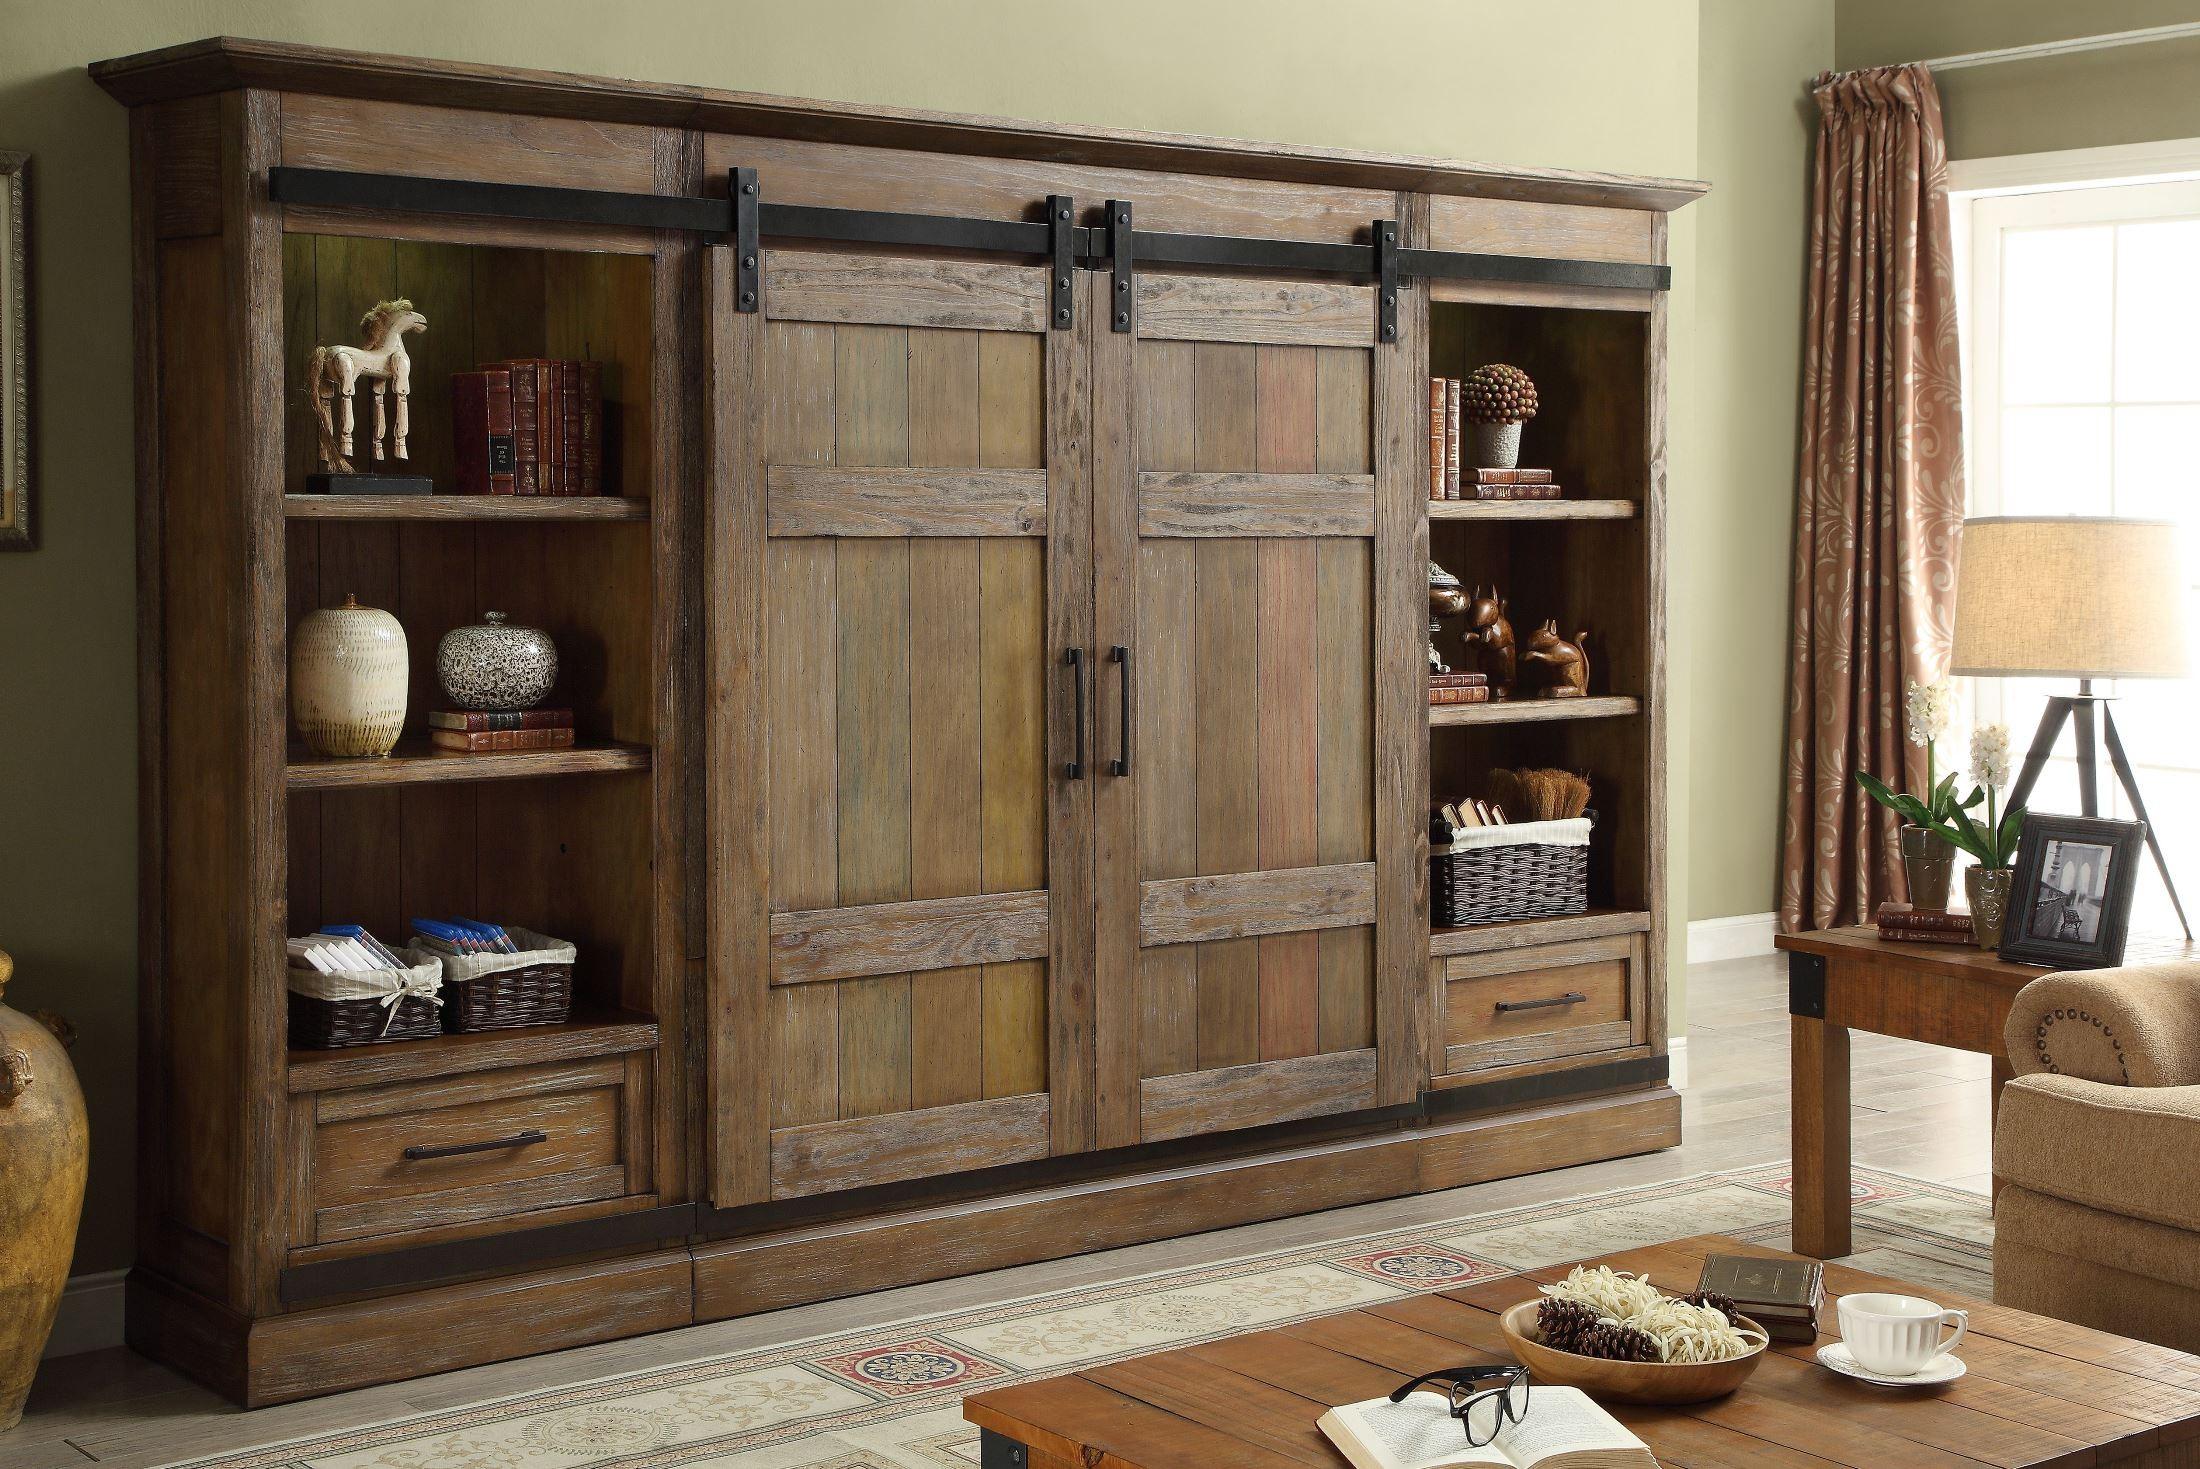 Driftwood Kitchen Cabinets Hunts Point Vintage Weathered Pine Sliding Door